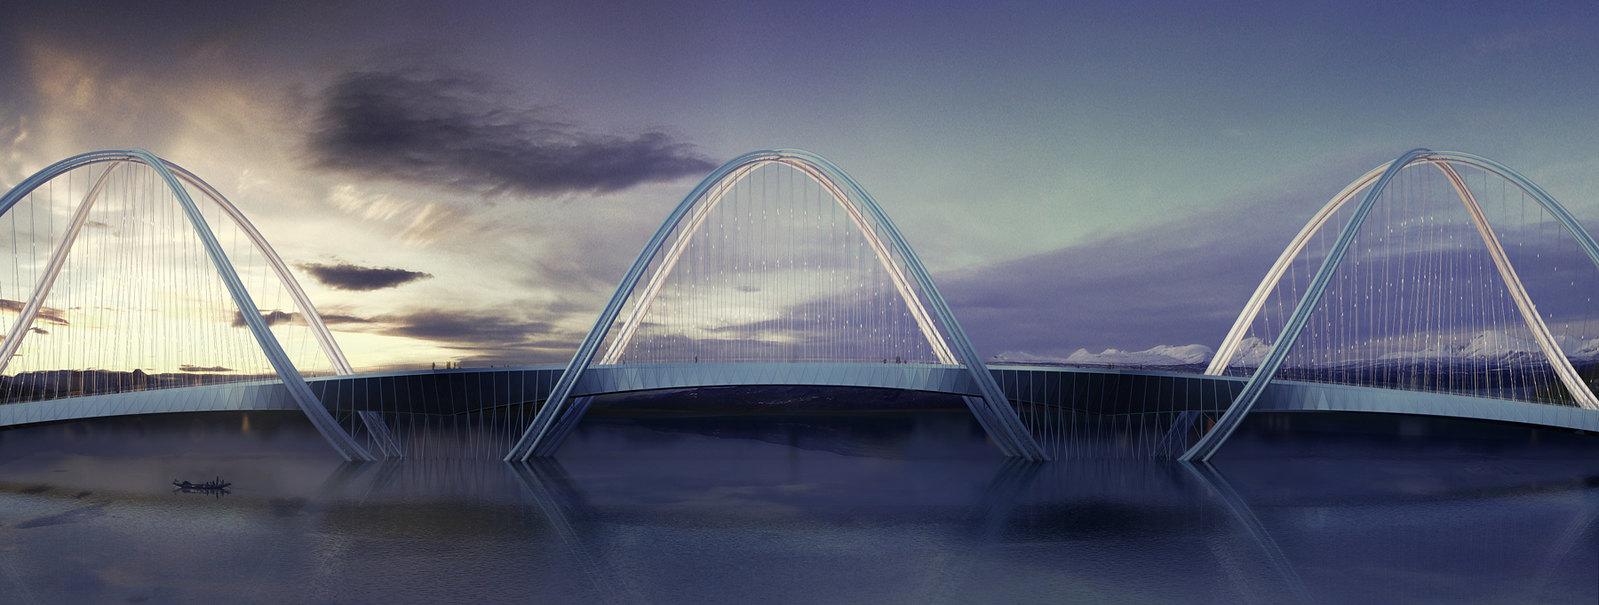 Олимпийский мост в Пекине. Проект Penda